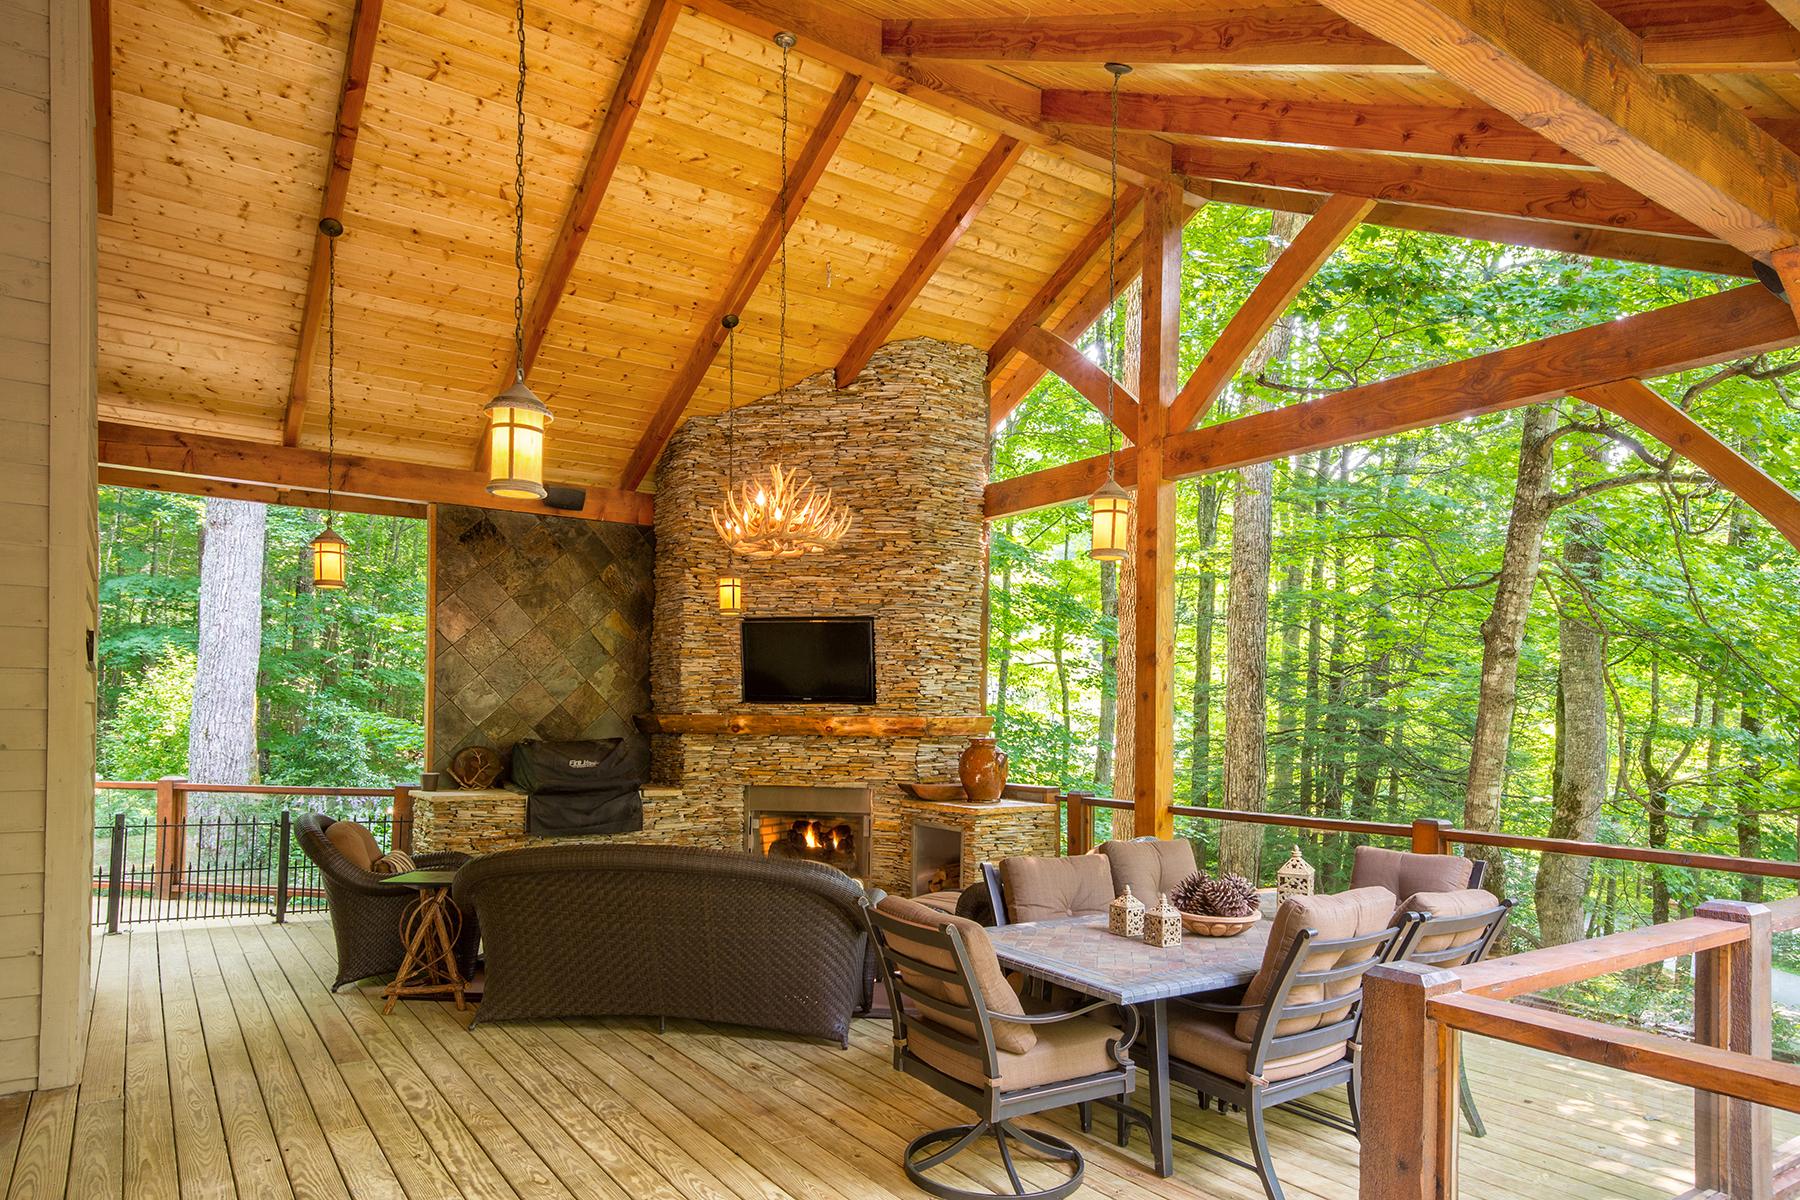 Nhà ở một gia đình vì Bán tại LINVILLE - LINVILLE RIDGE 108 Rock Ledge Lane Linville, Bắc Carolina, 28646 Hoa Kỳ